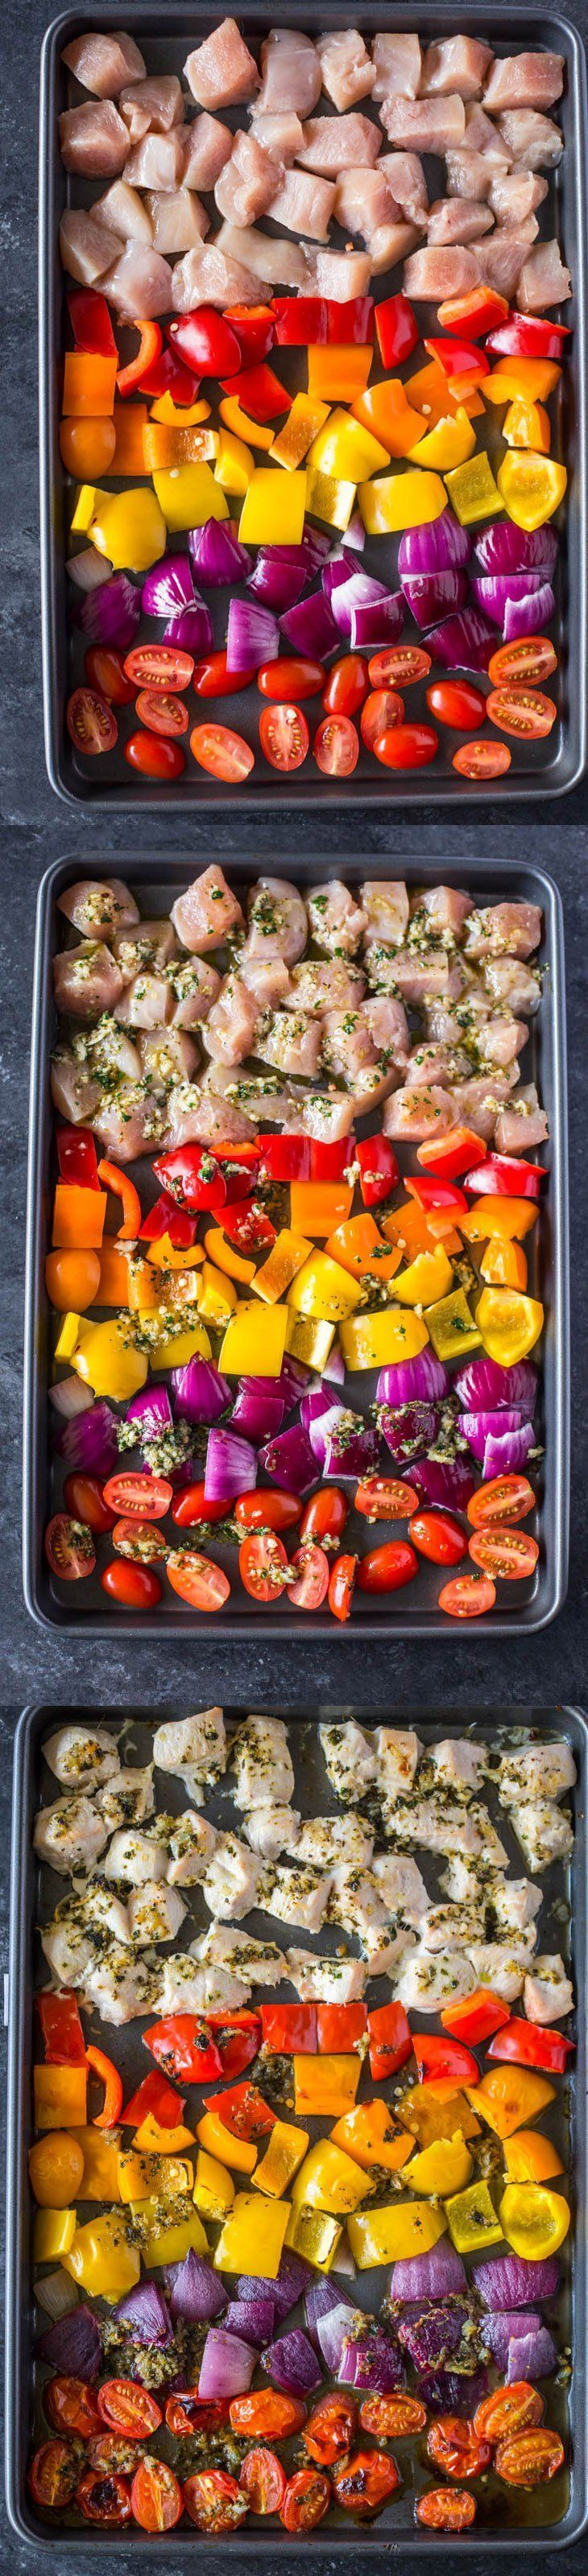 Sheet Pan Greek Chicken & Veggies + Pita Pockets   Gimme Delicious http://feedproxy.google.com/topfashionfood